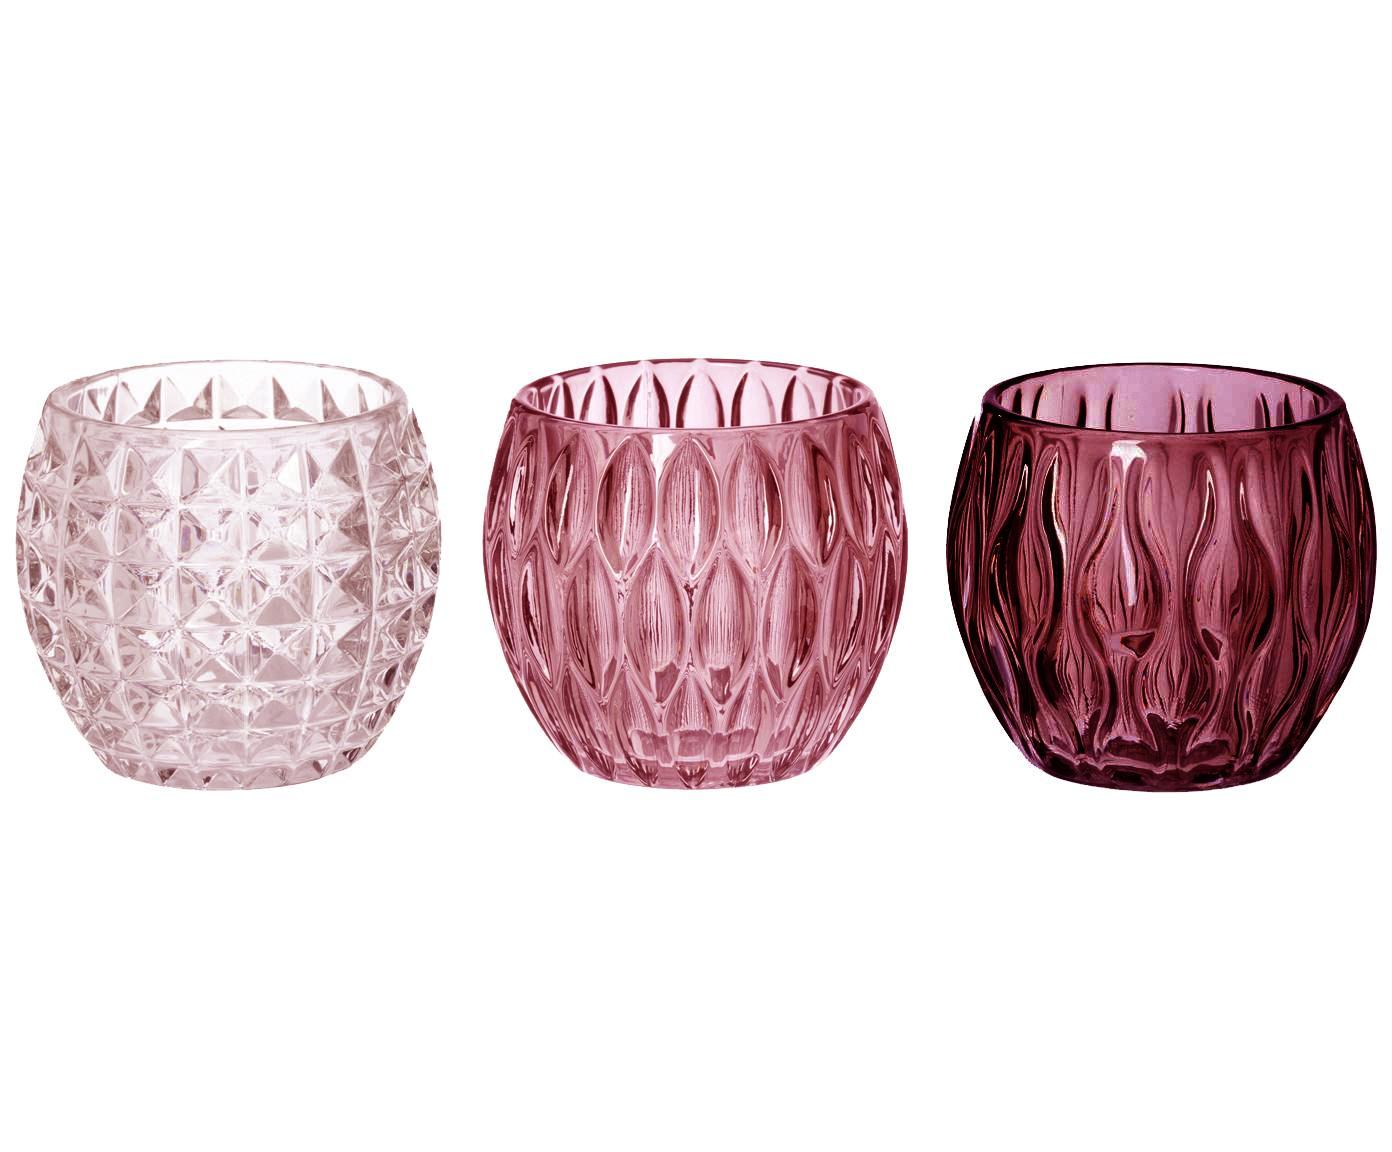 Set de portavelas Aliza, 3pzas., Vidrio, Rosa, transparente, Ø 10 x Al 9 cm